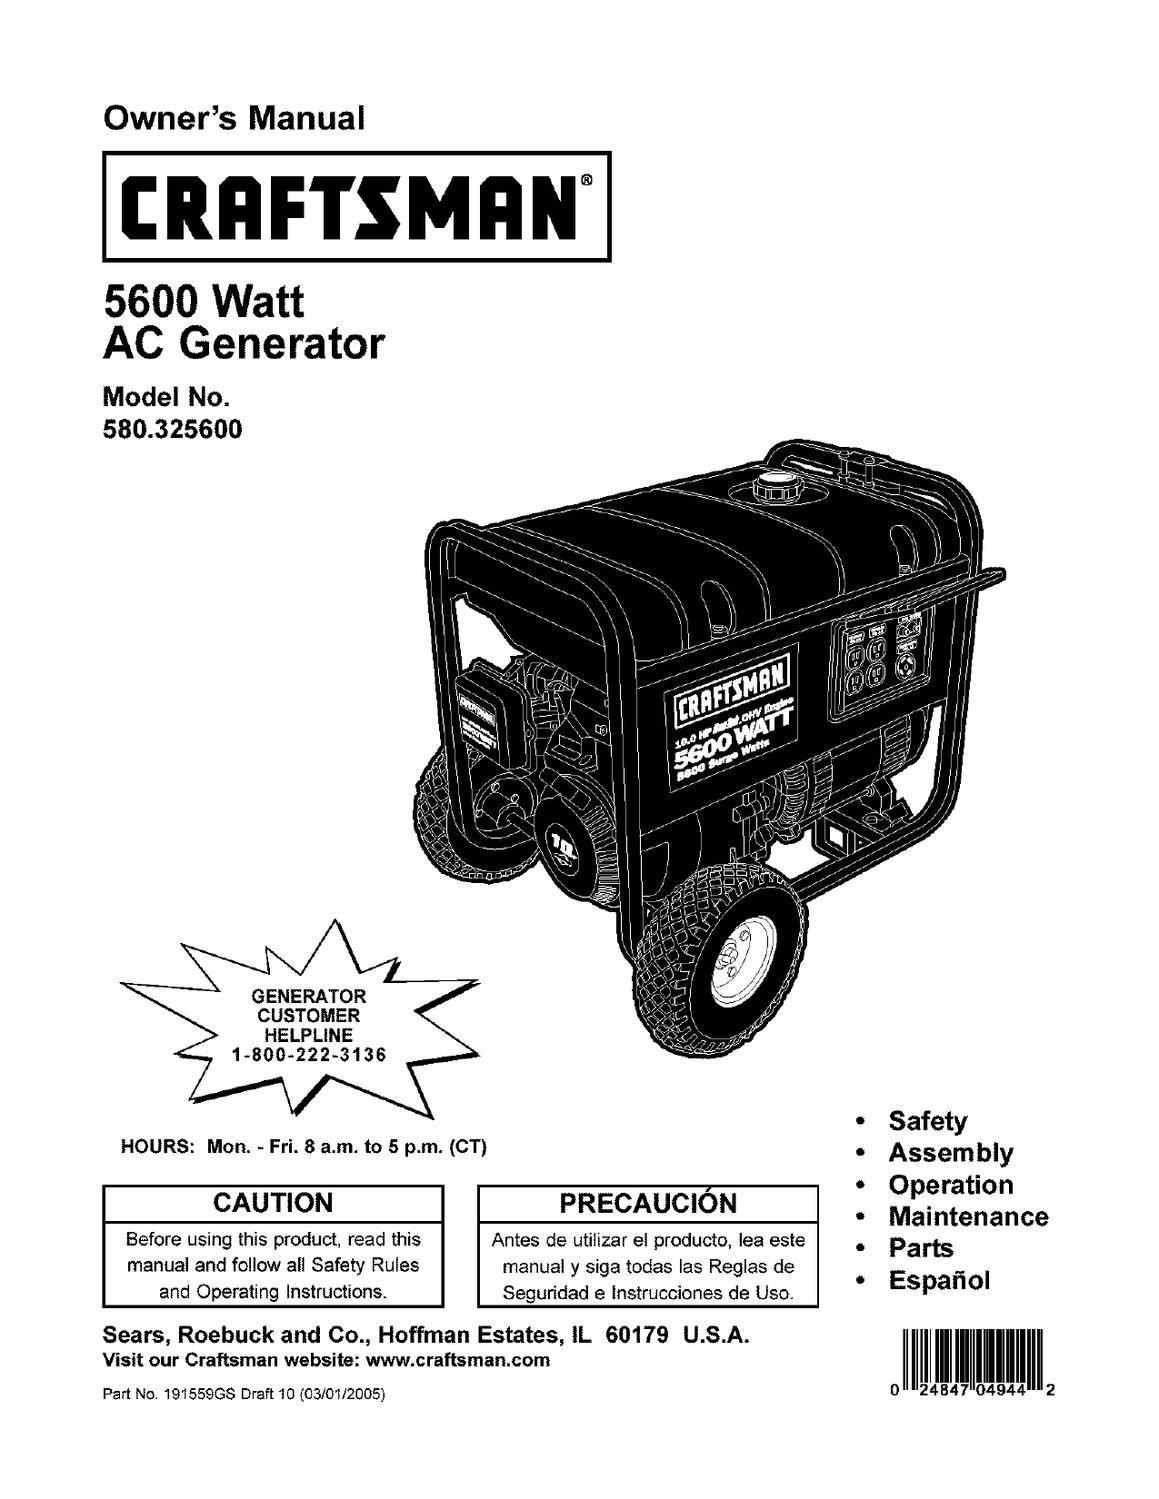 craftsman generator model 580 325600 by patrick plageman